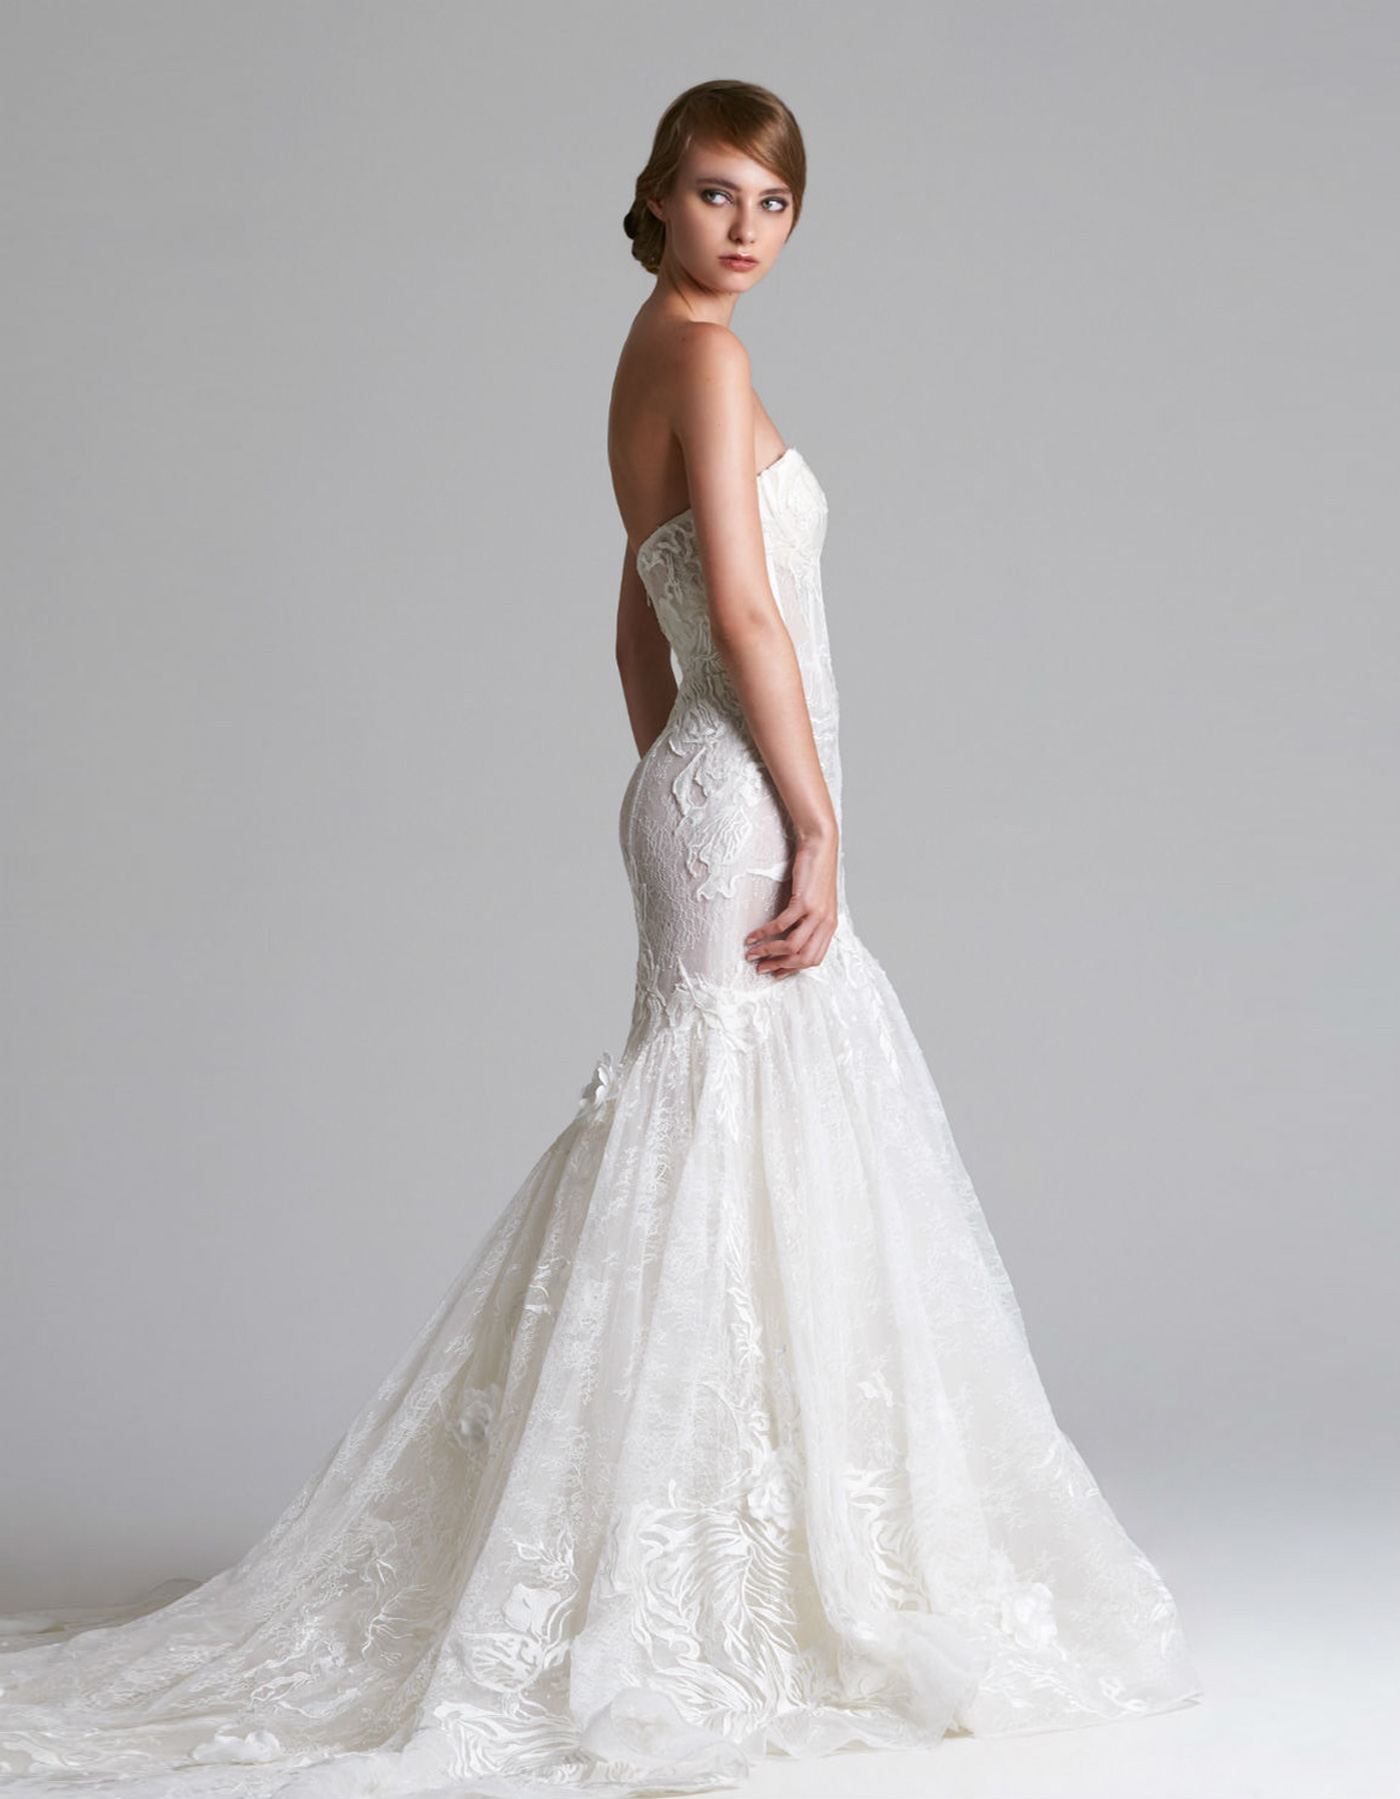 Corset fishtail wedding dress | Adeline by Halen Contstance